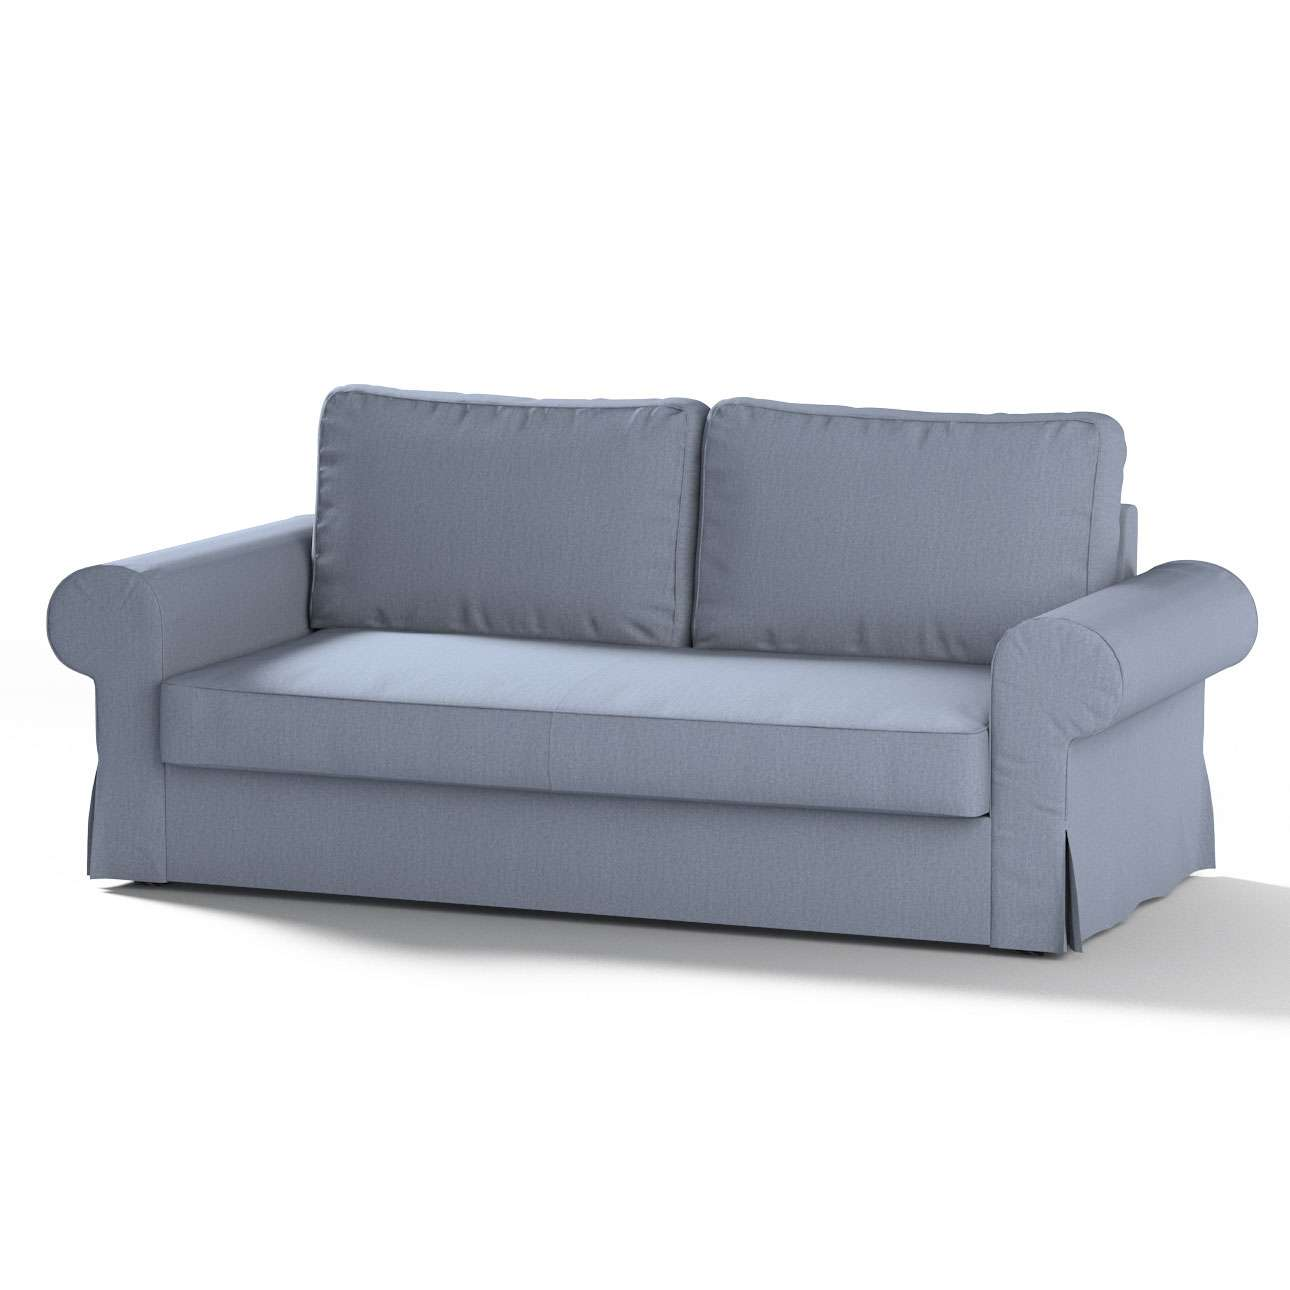 backabro 3 sitzer sofabezug ausklappbar silber blau dekoria. Black Bedroom Furniture Sets. Home Design Ideas